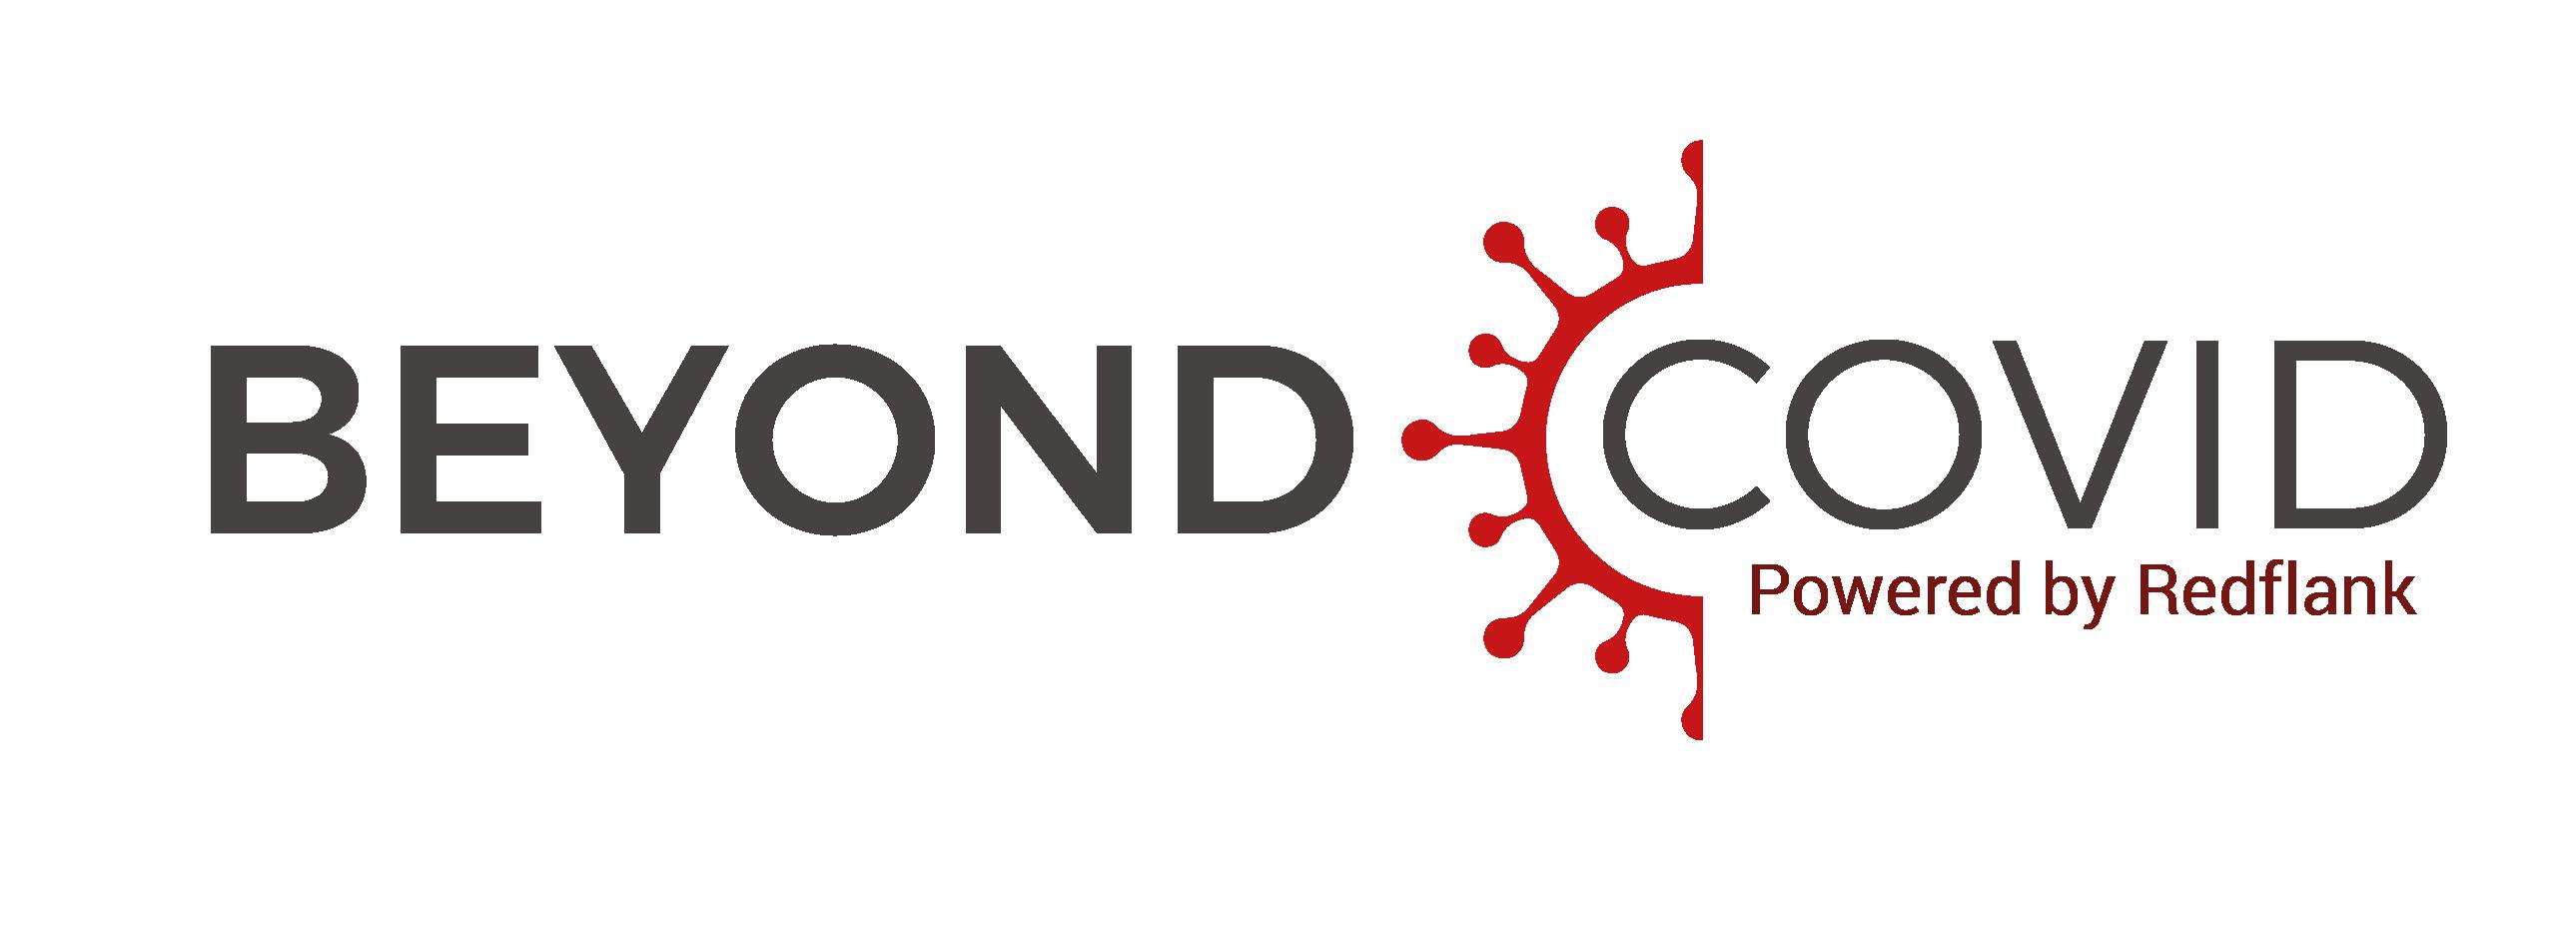 BeyondCOVID